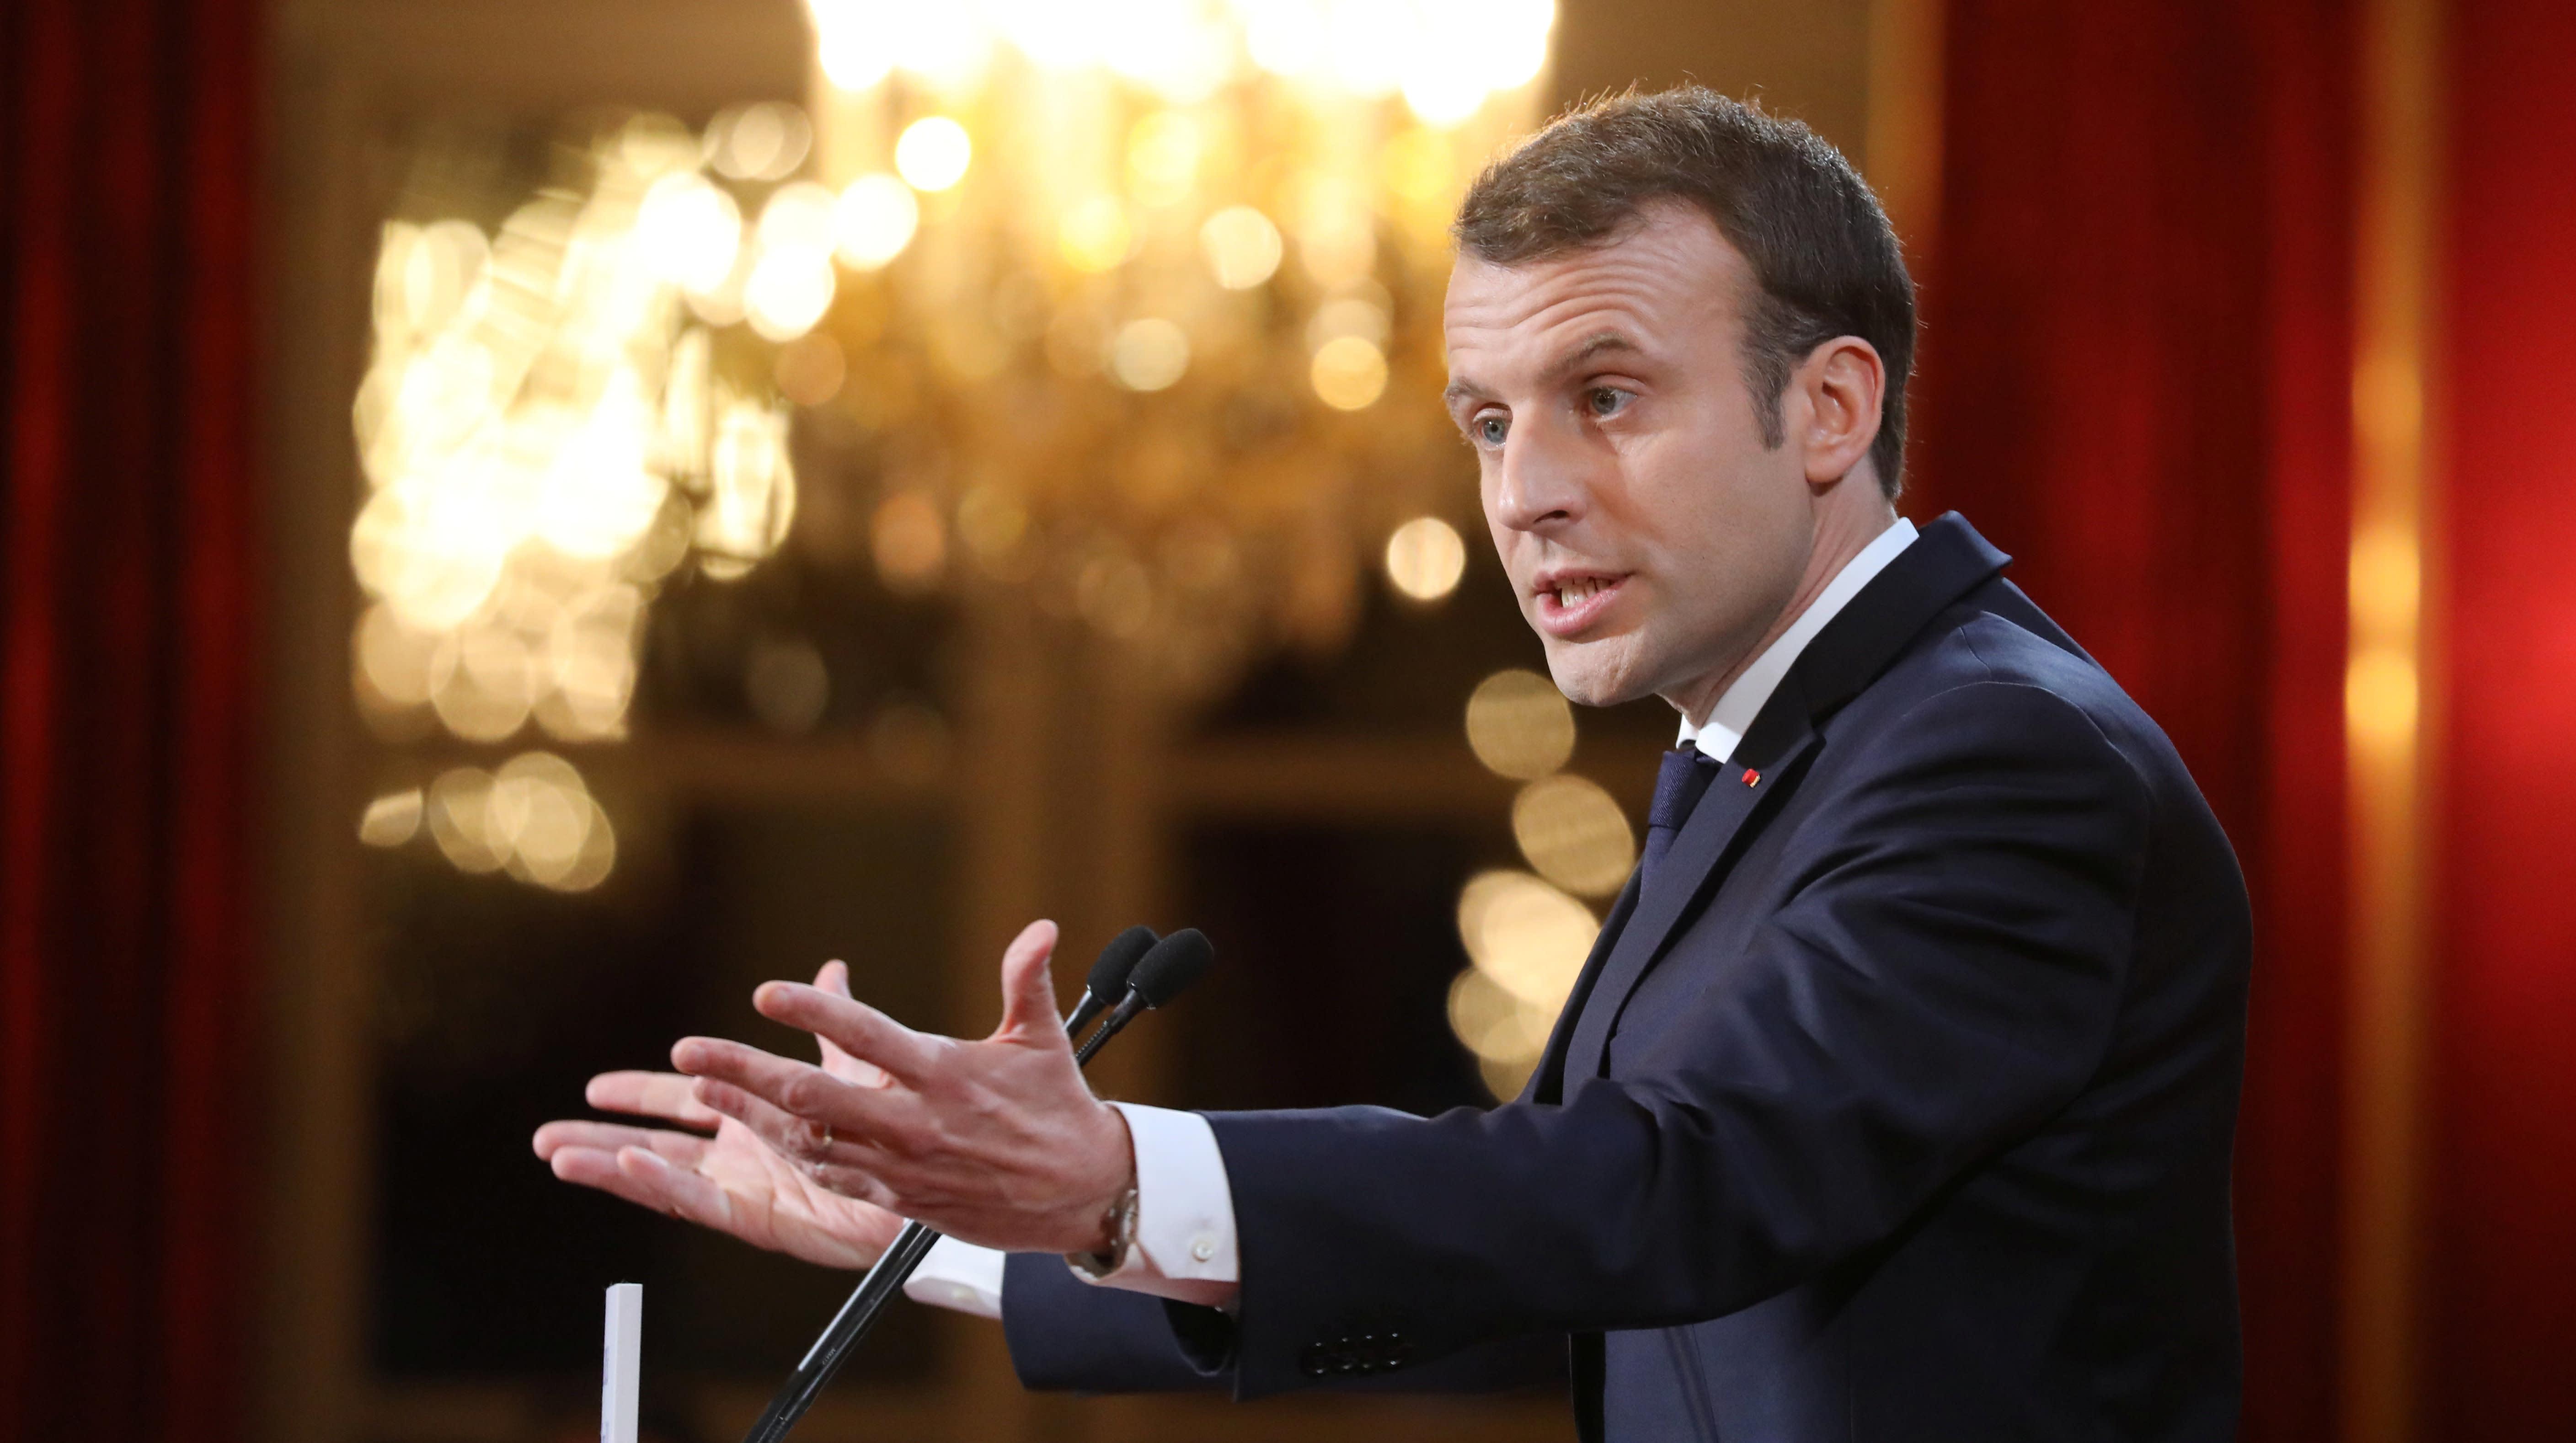 French President Emmanuel Macron Vows To Ban 'Fake News'